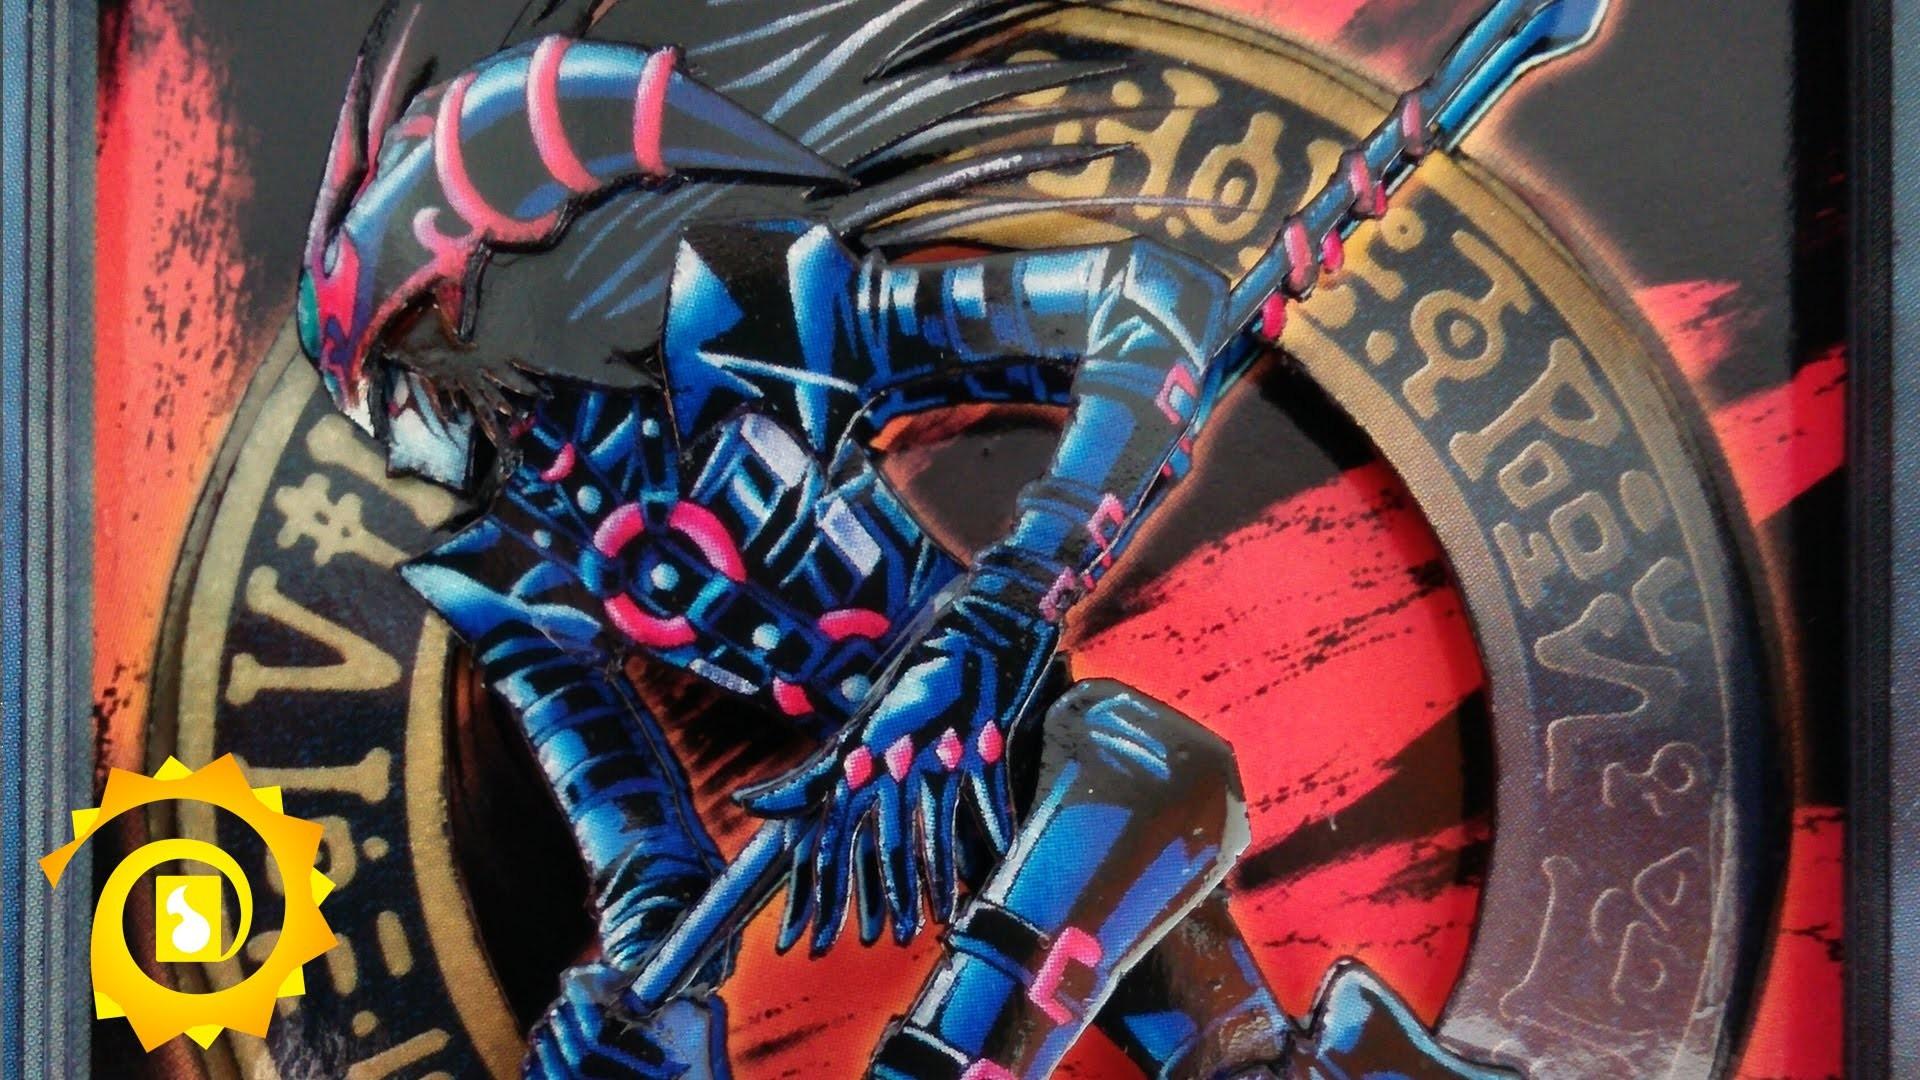 Yu-Gi-Oh 3D: Dark Magician of Chaos